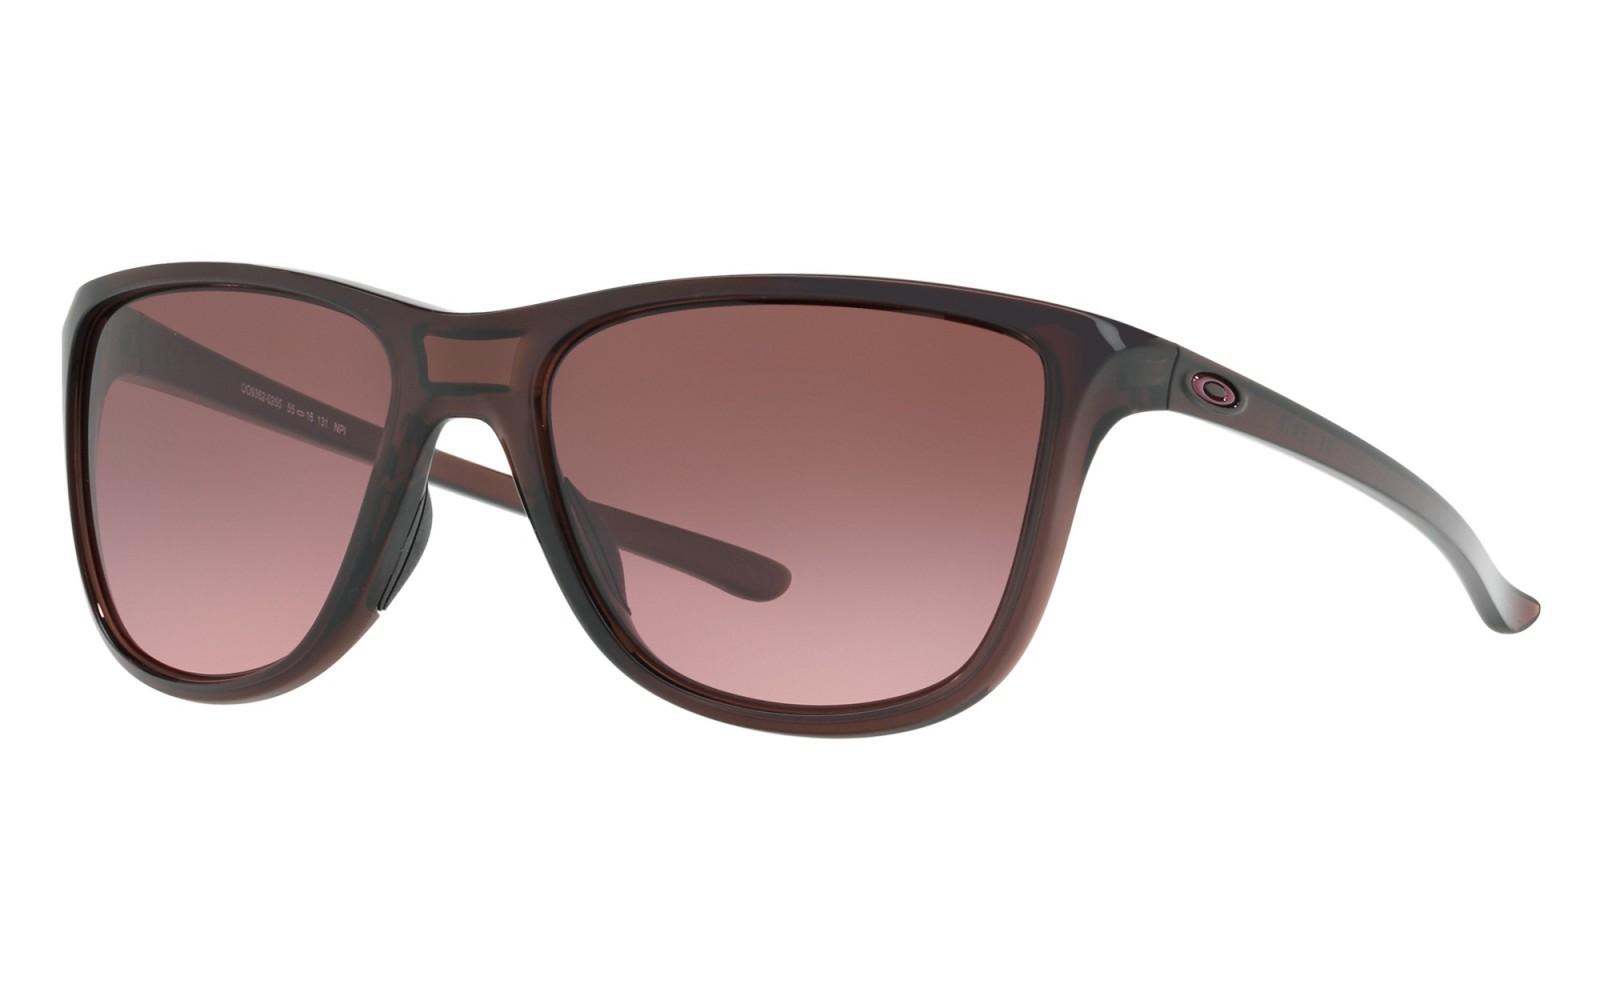 Oakley Reverie - Amethyst / G40 Black Gradient - OO9362-0255 Zonnebril